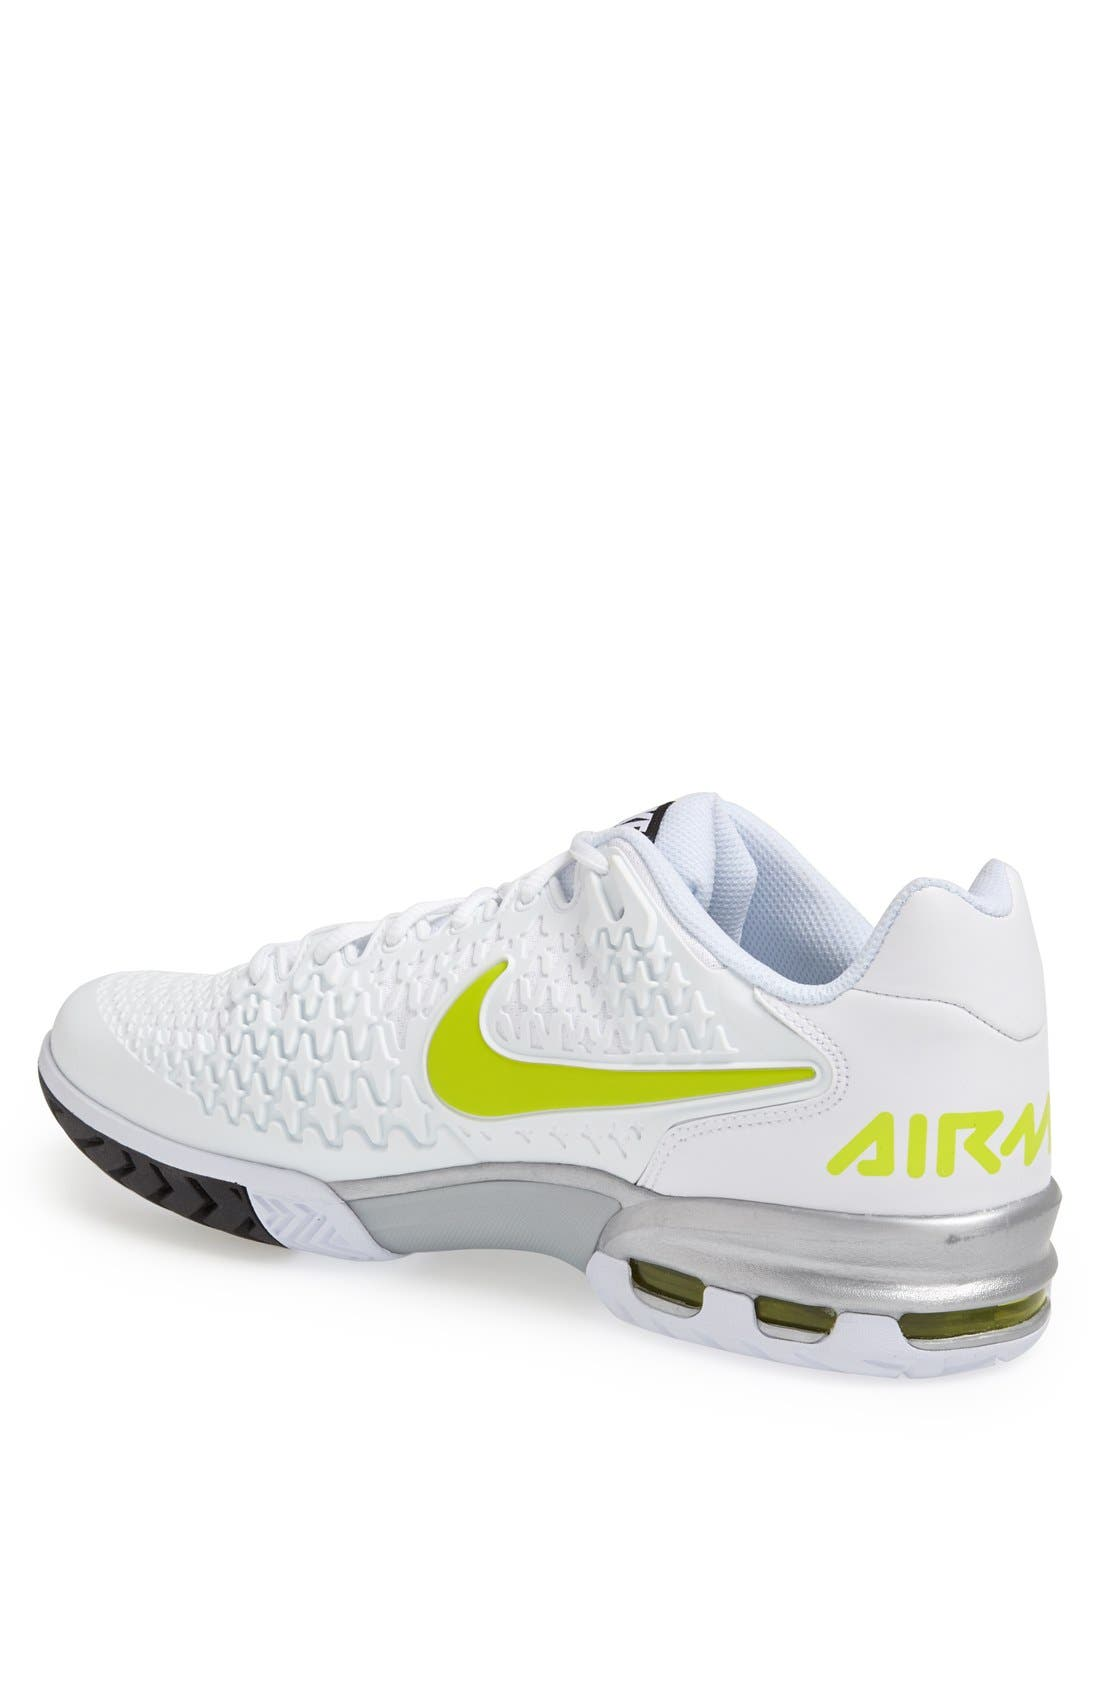 Alternate Image 2  - Nike 'Air Max Cage' Tennis Shoe (Men)